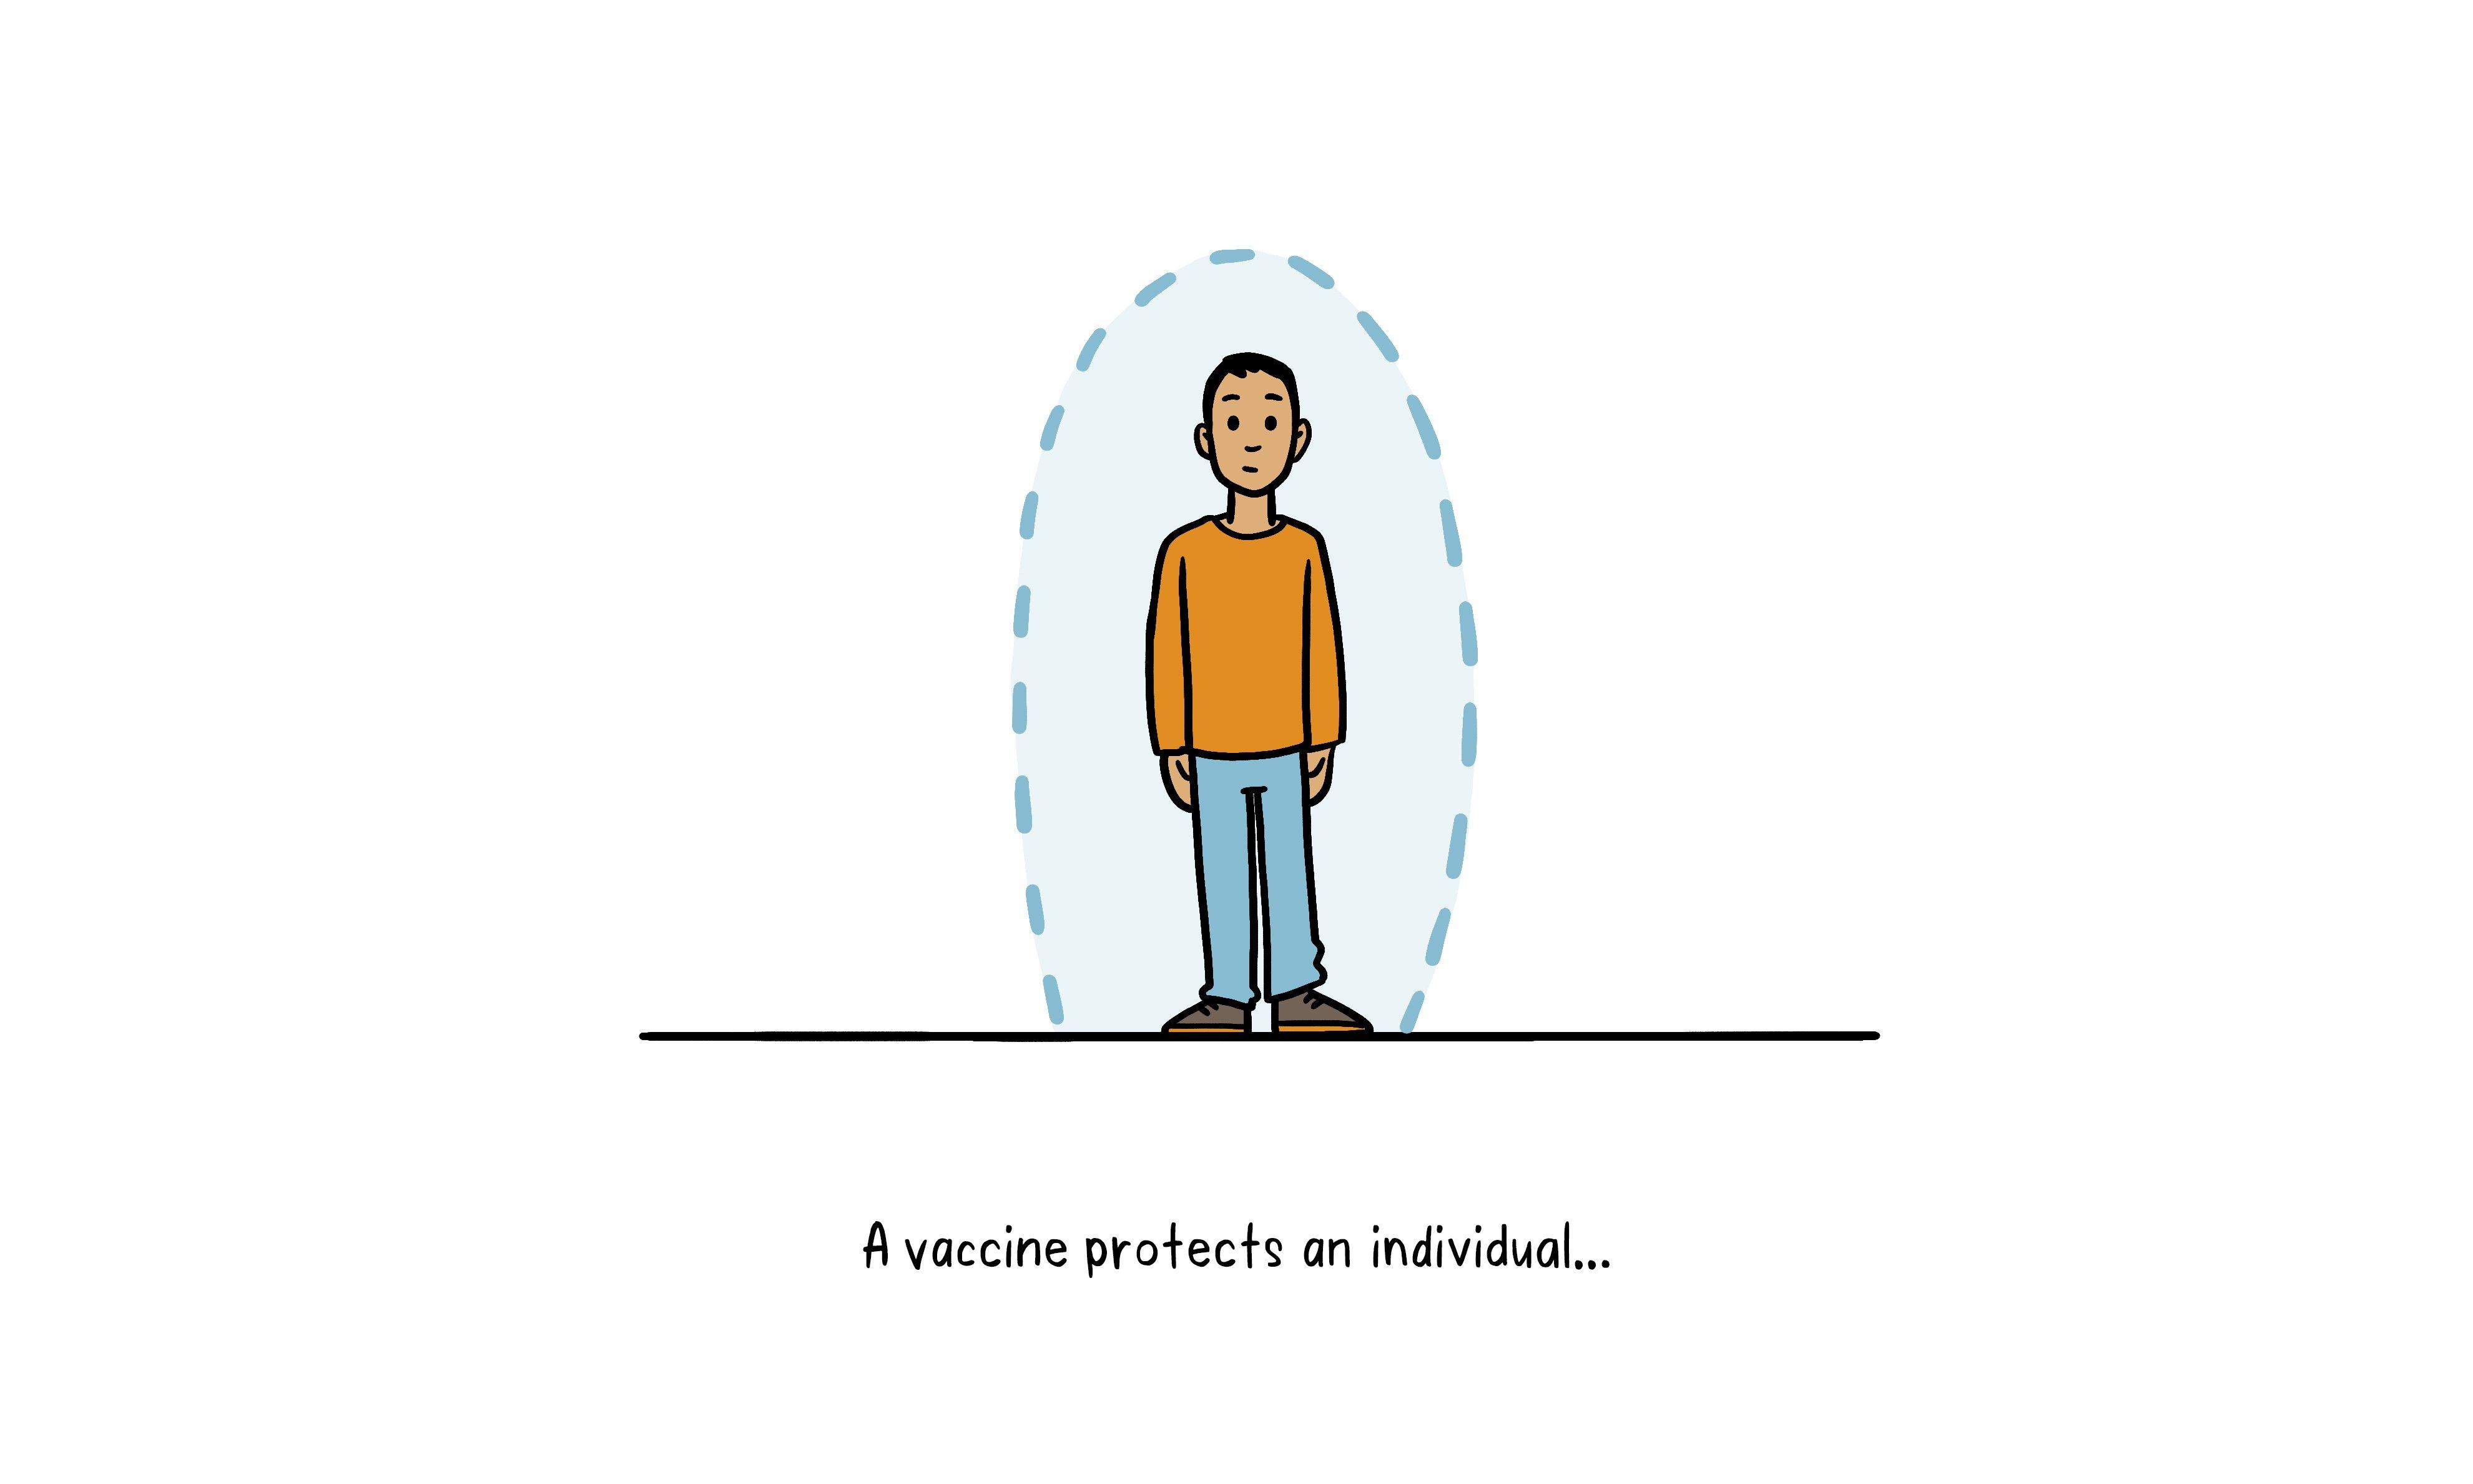 vaccines-topic-1-illustrations-03